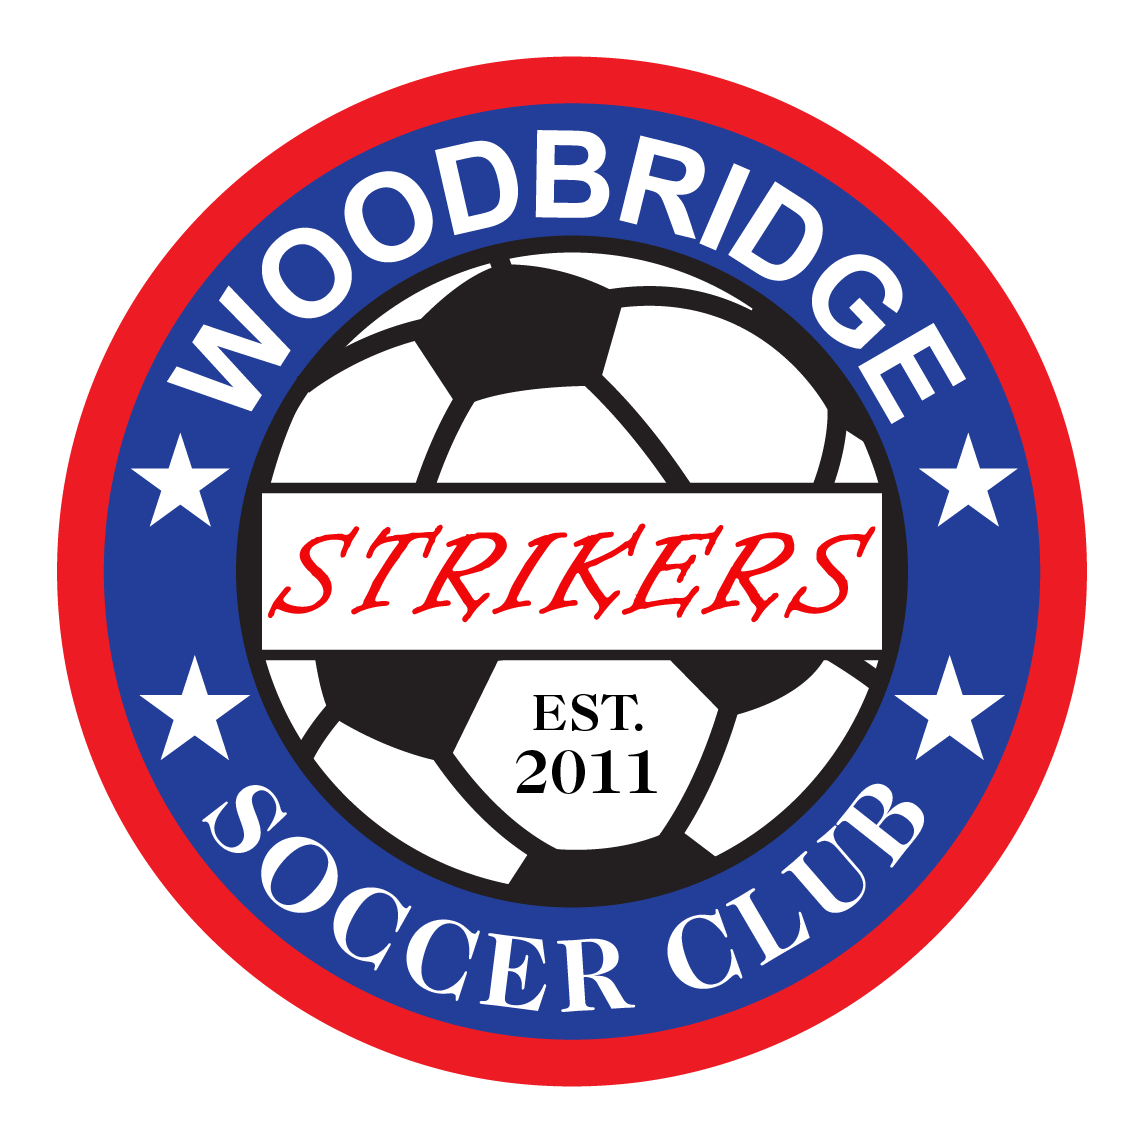 woodbridgesc